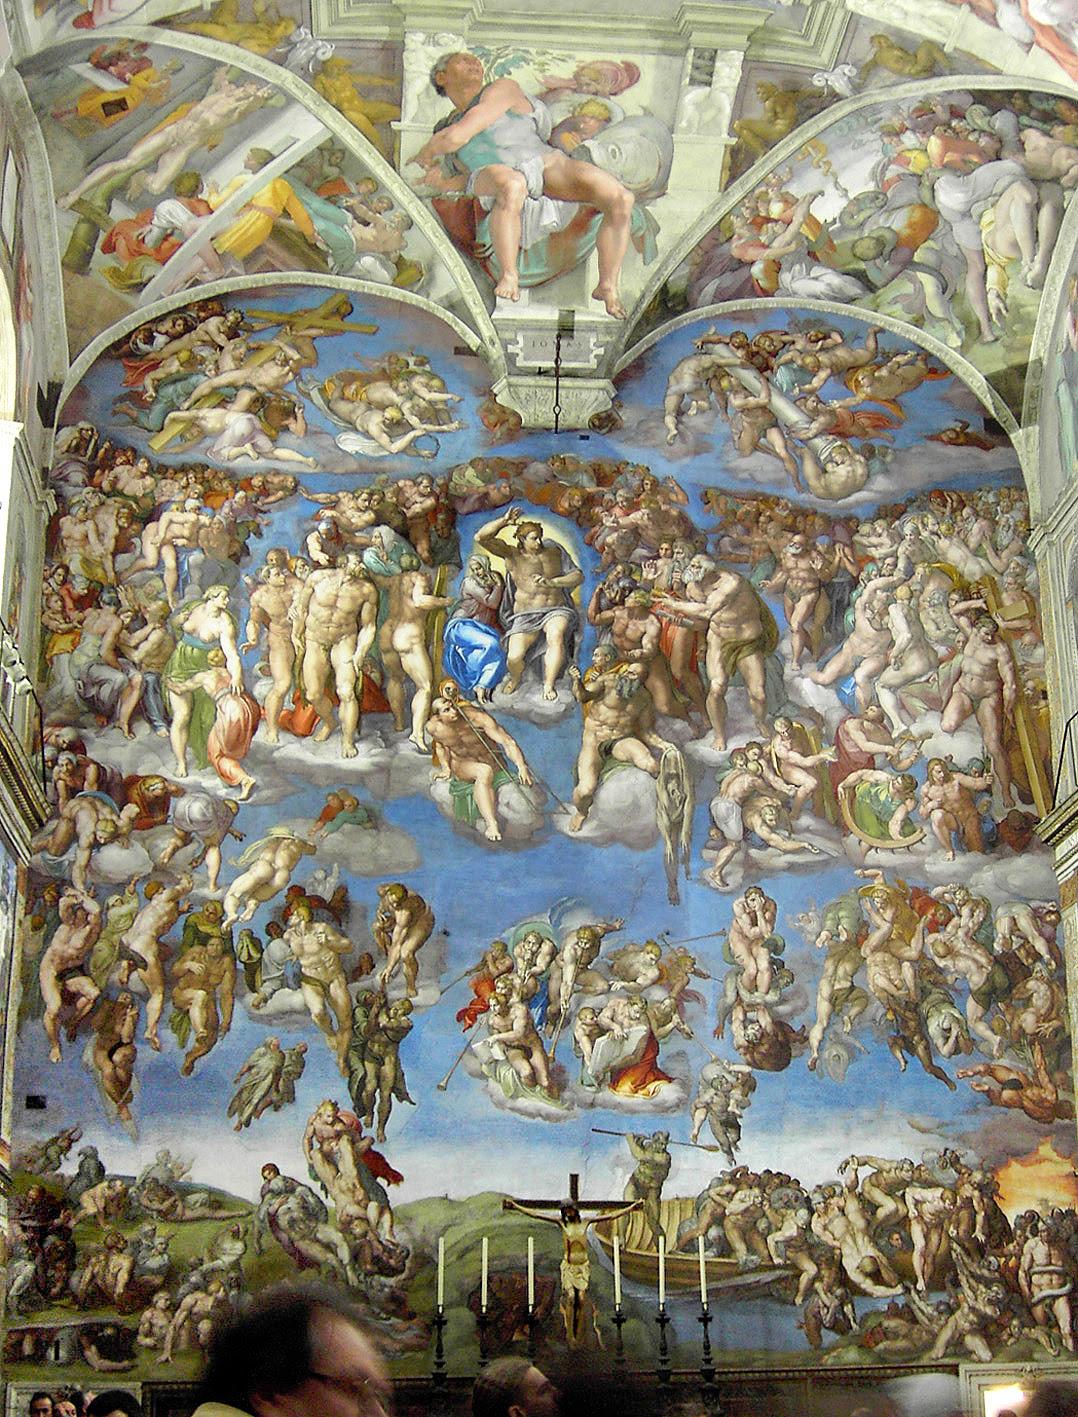 Afresco, O Juízo Final D' Michelangelo Buonarroti (Capela Sistina, Palácio Apostólico,Vaticano